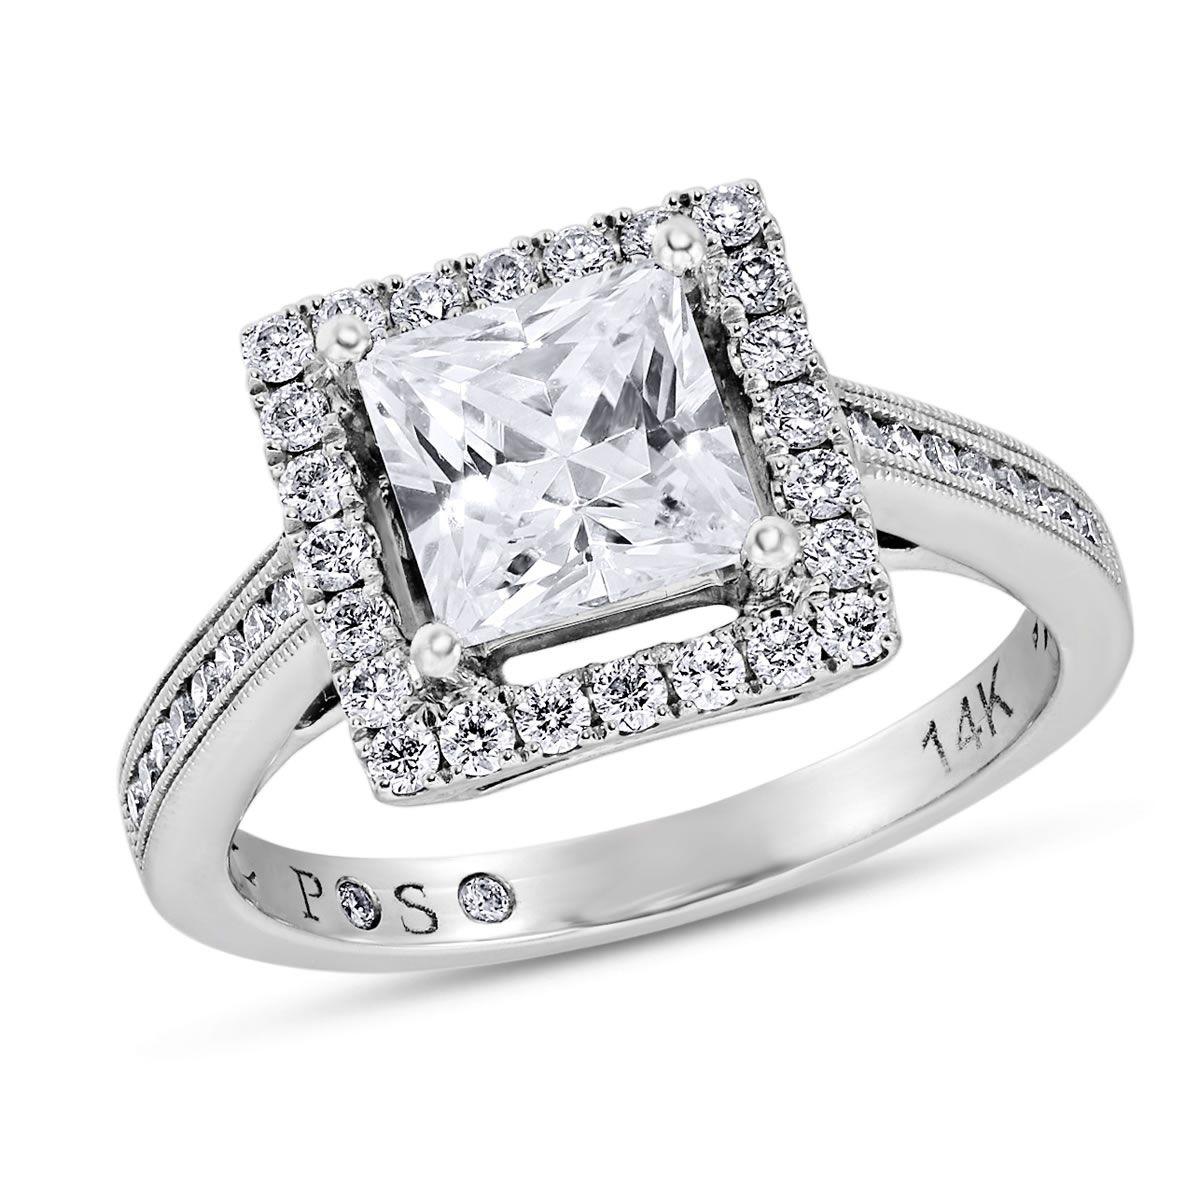 PassionStone Collection, 14k White Gold Princess SI2